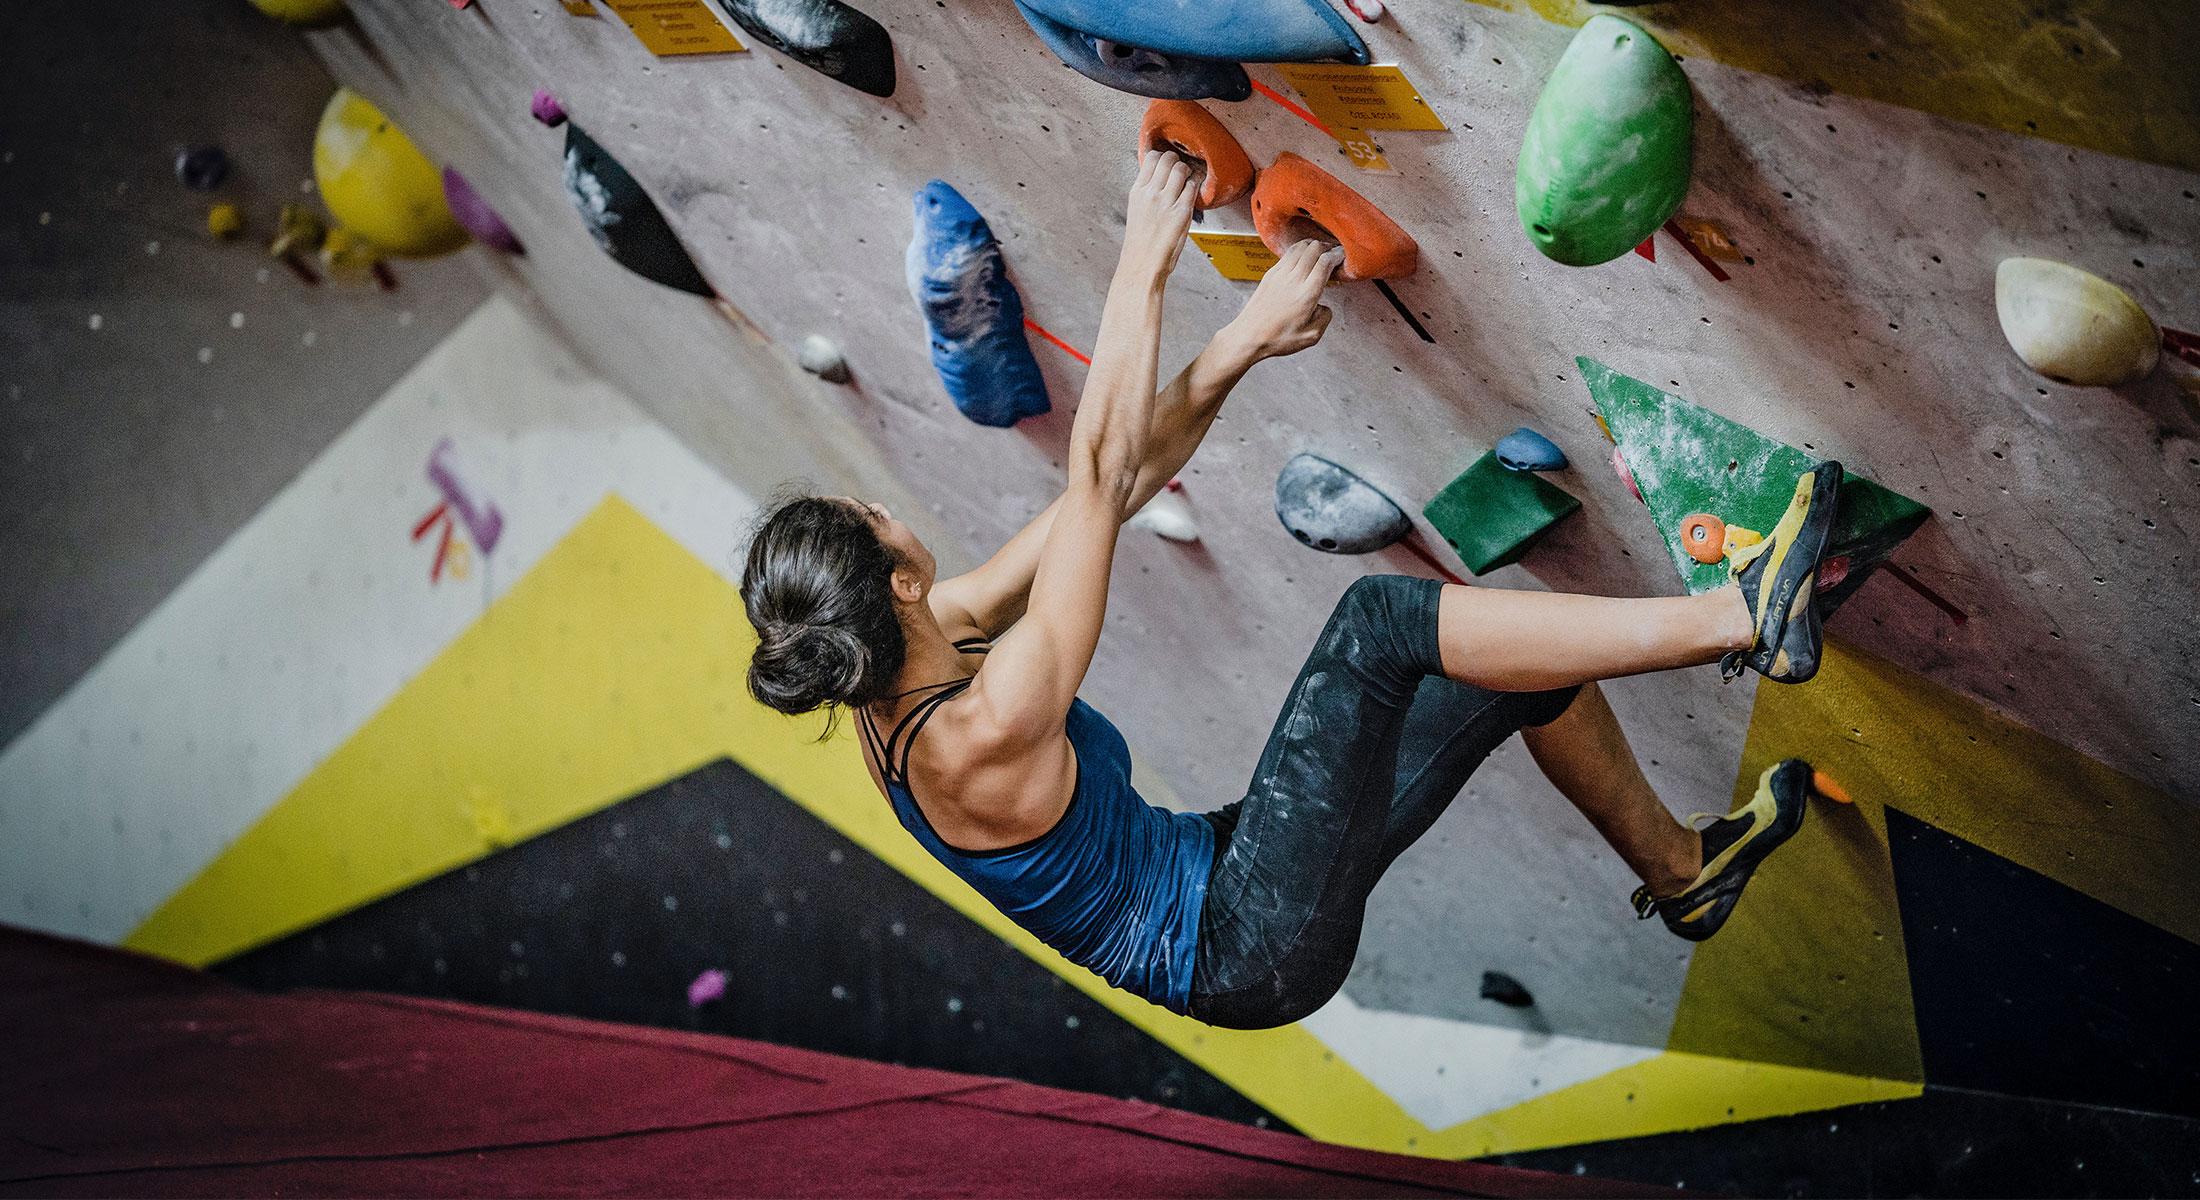 MCSH Veranstaltung JuMPs beim Bouldern